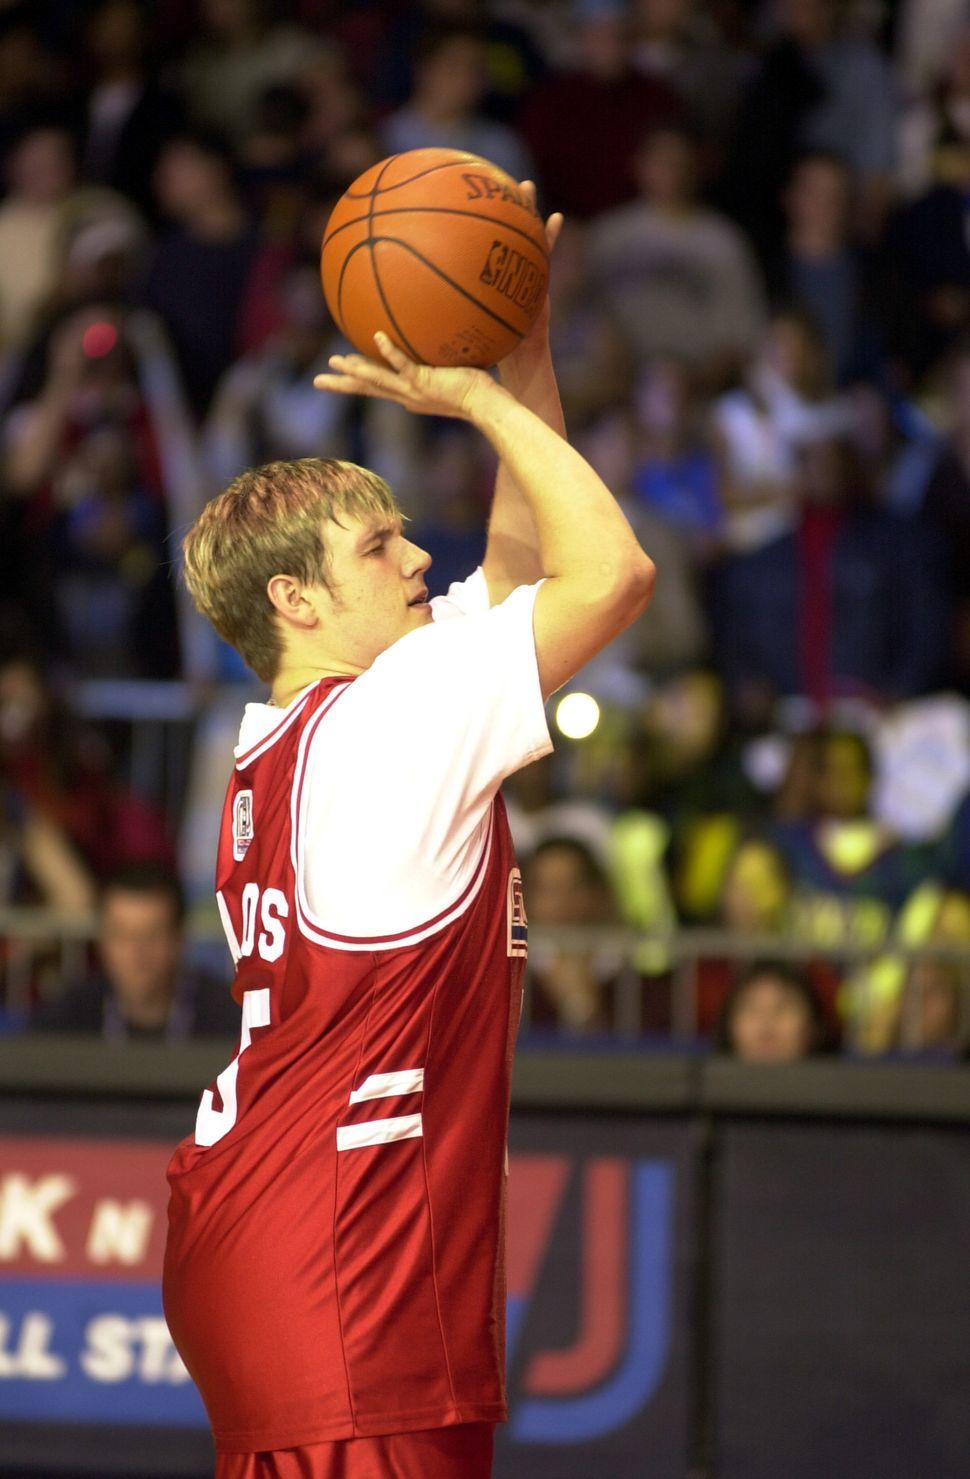 MTV Rock N' Jock NBA All-Star Jam, 2002